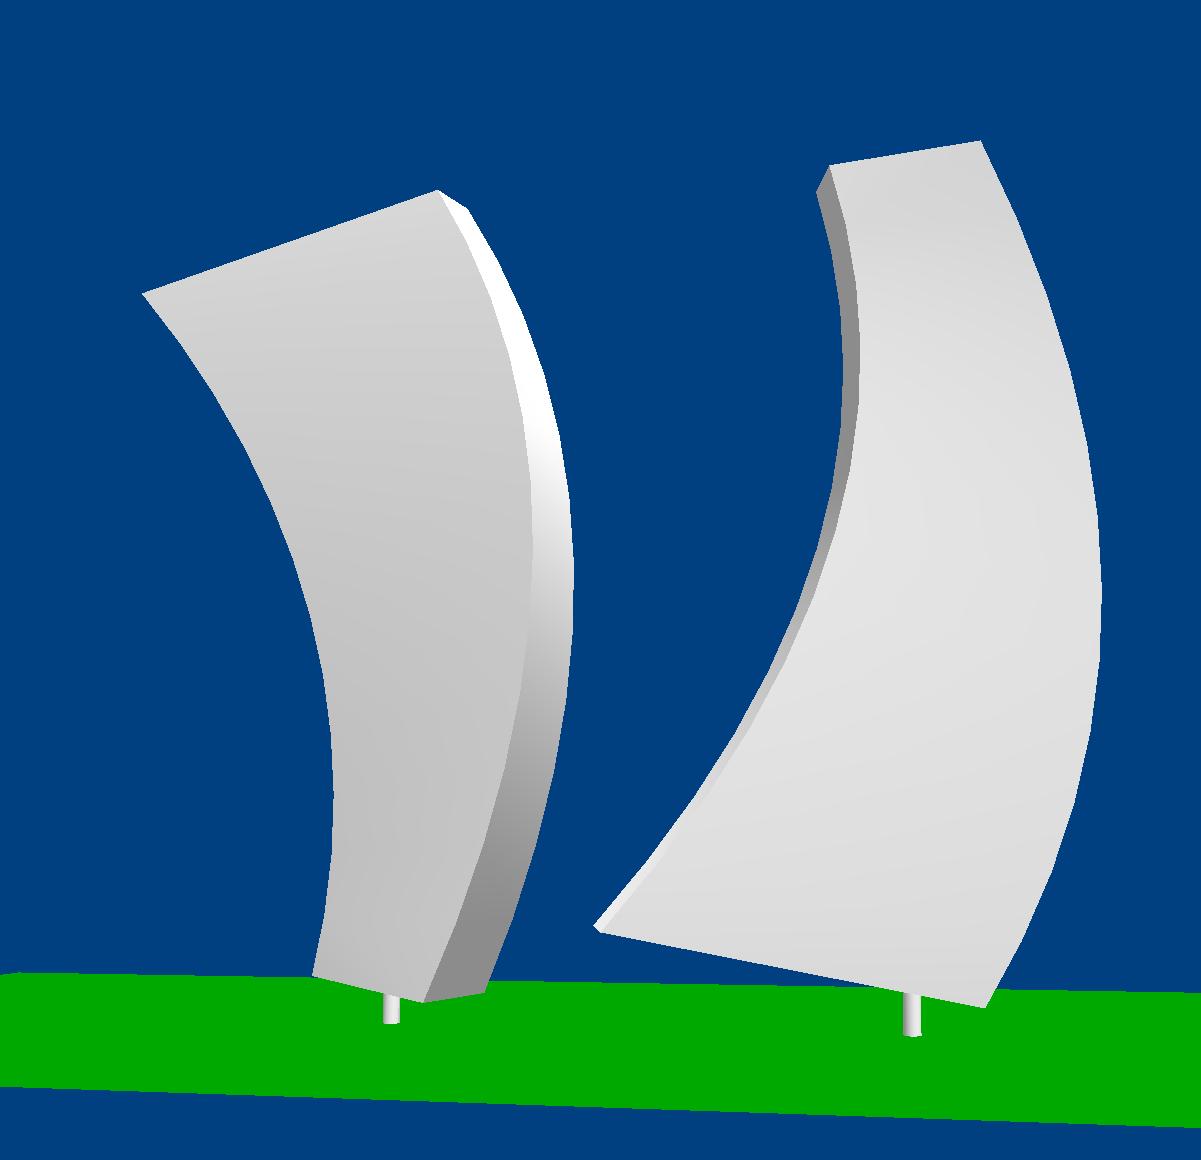 Front View (rendering)